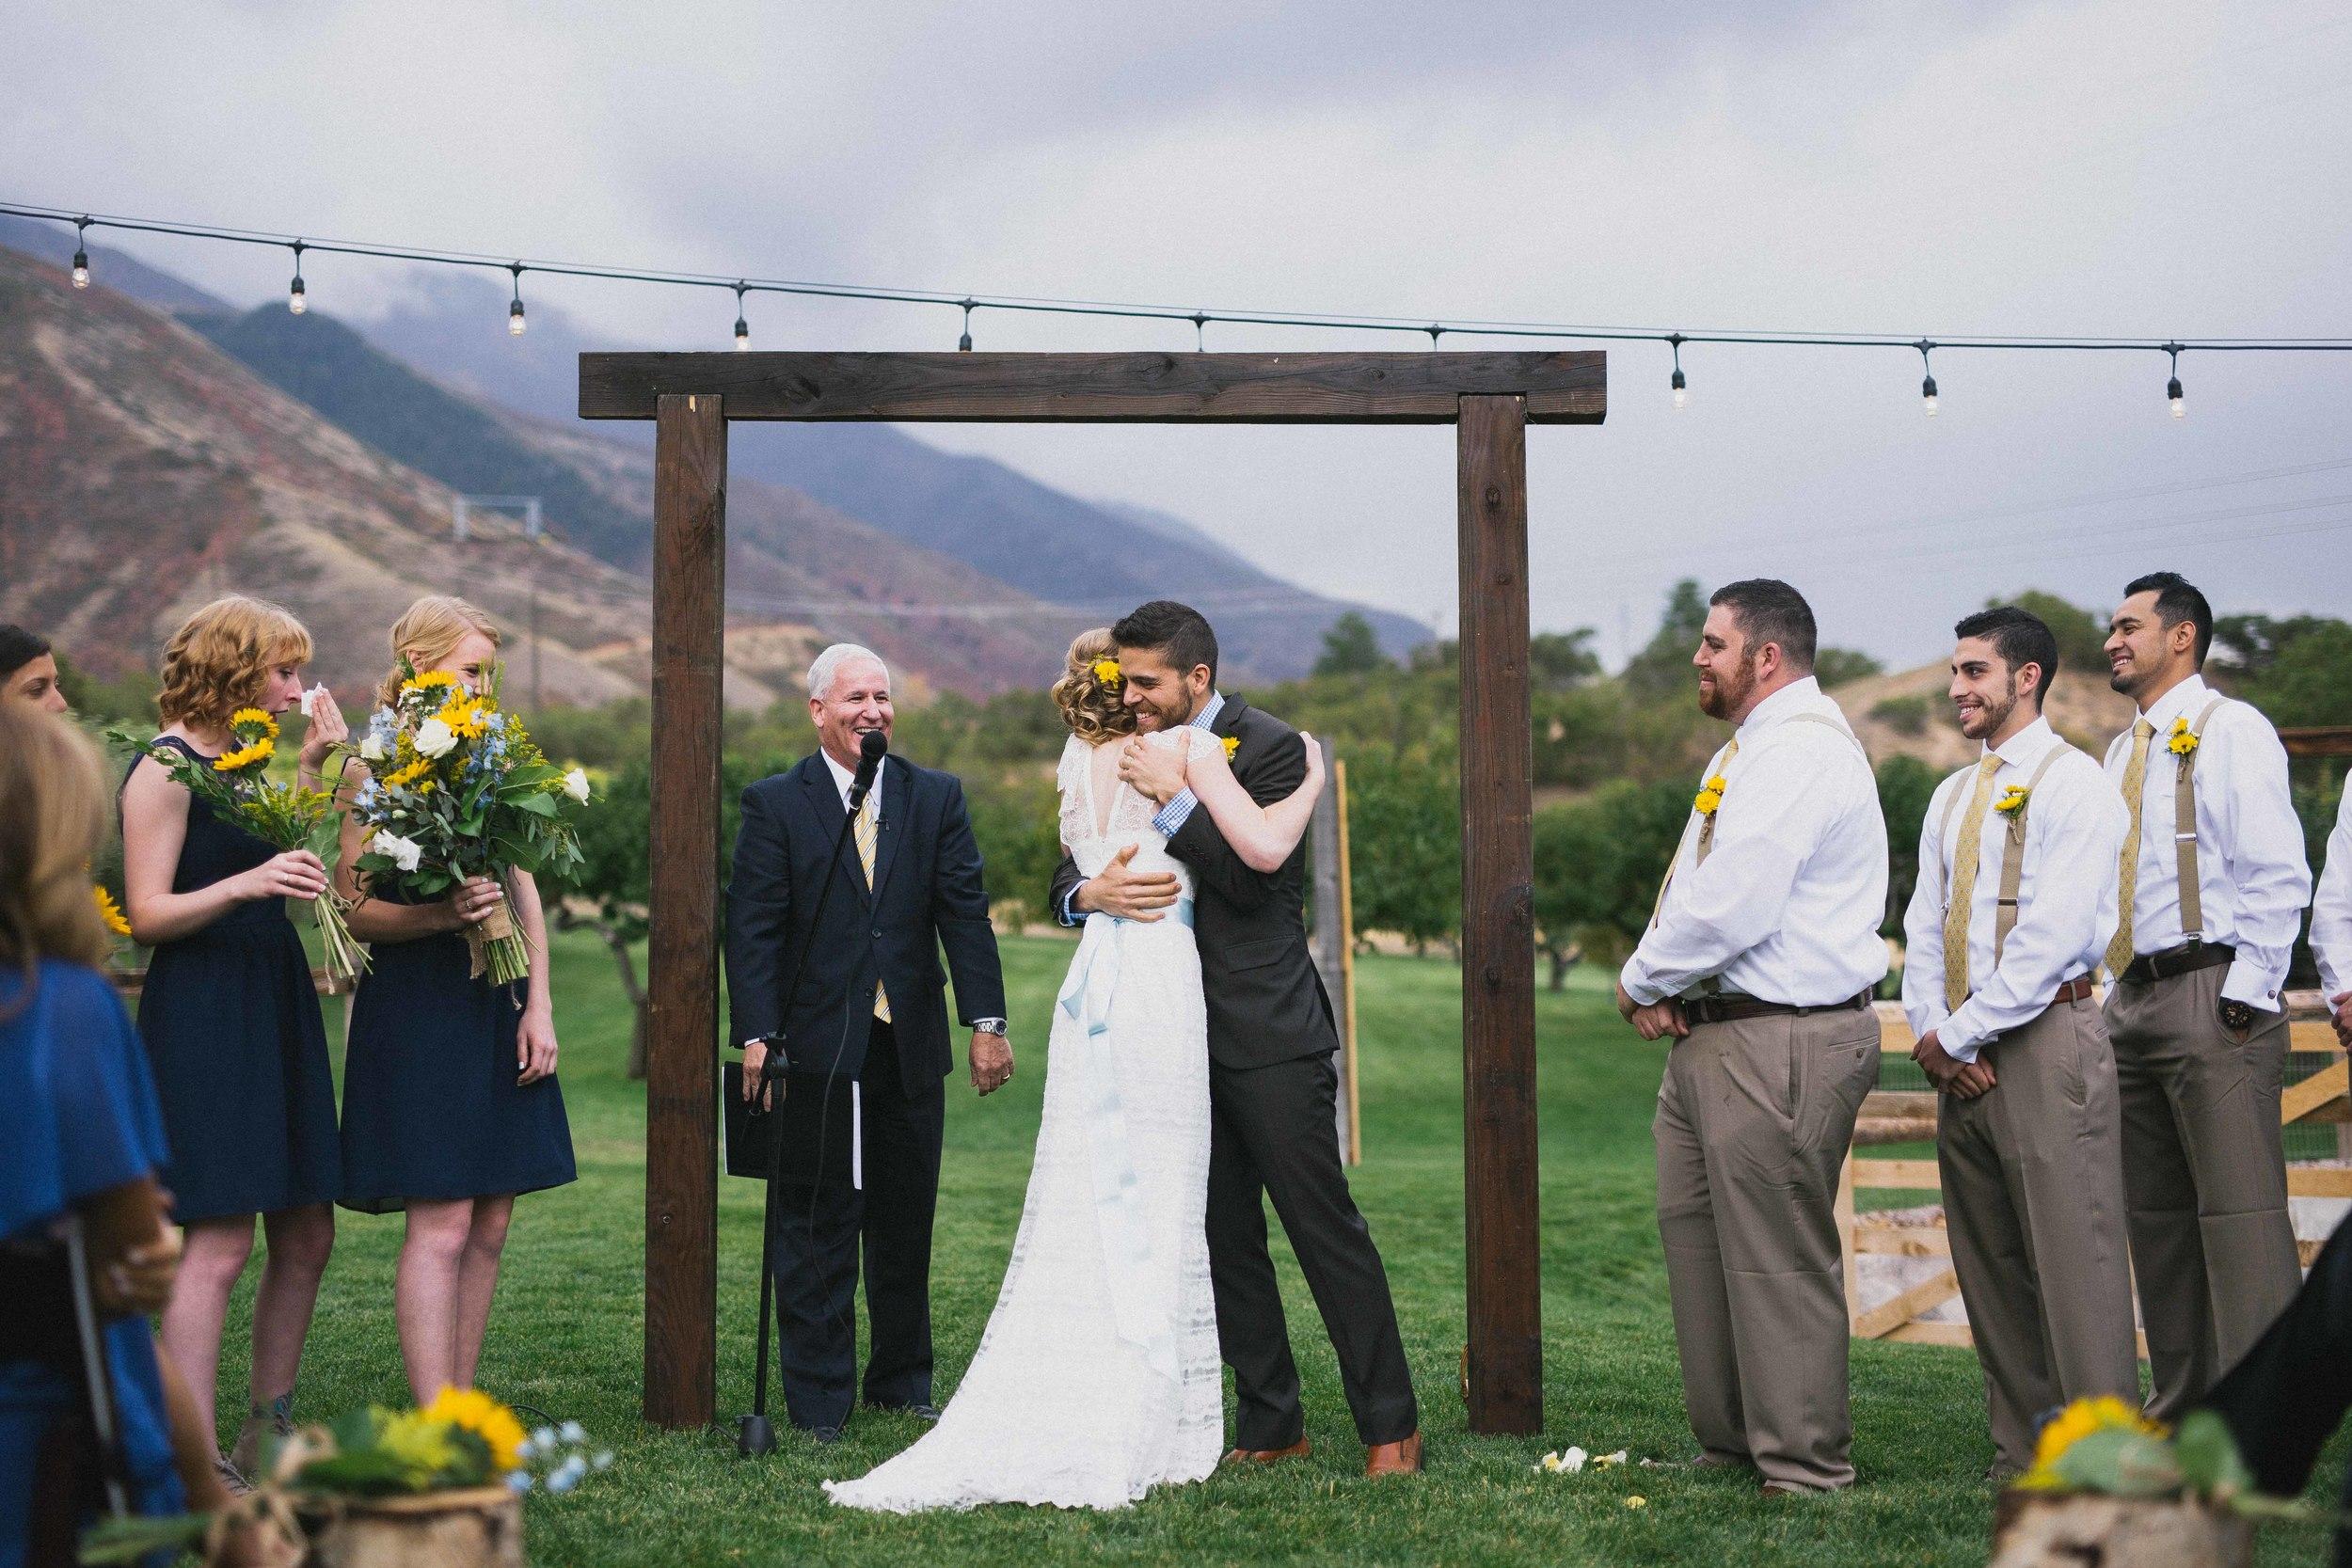 Salt-Lake-City-Utah-Wedding-Photographer-34.jpg